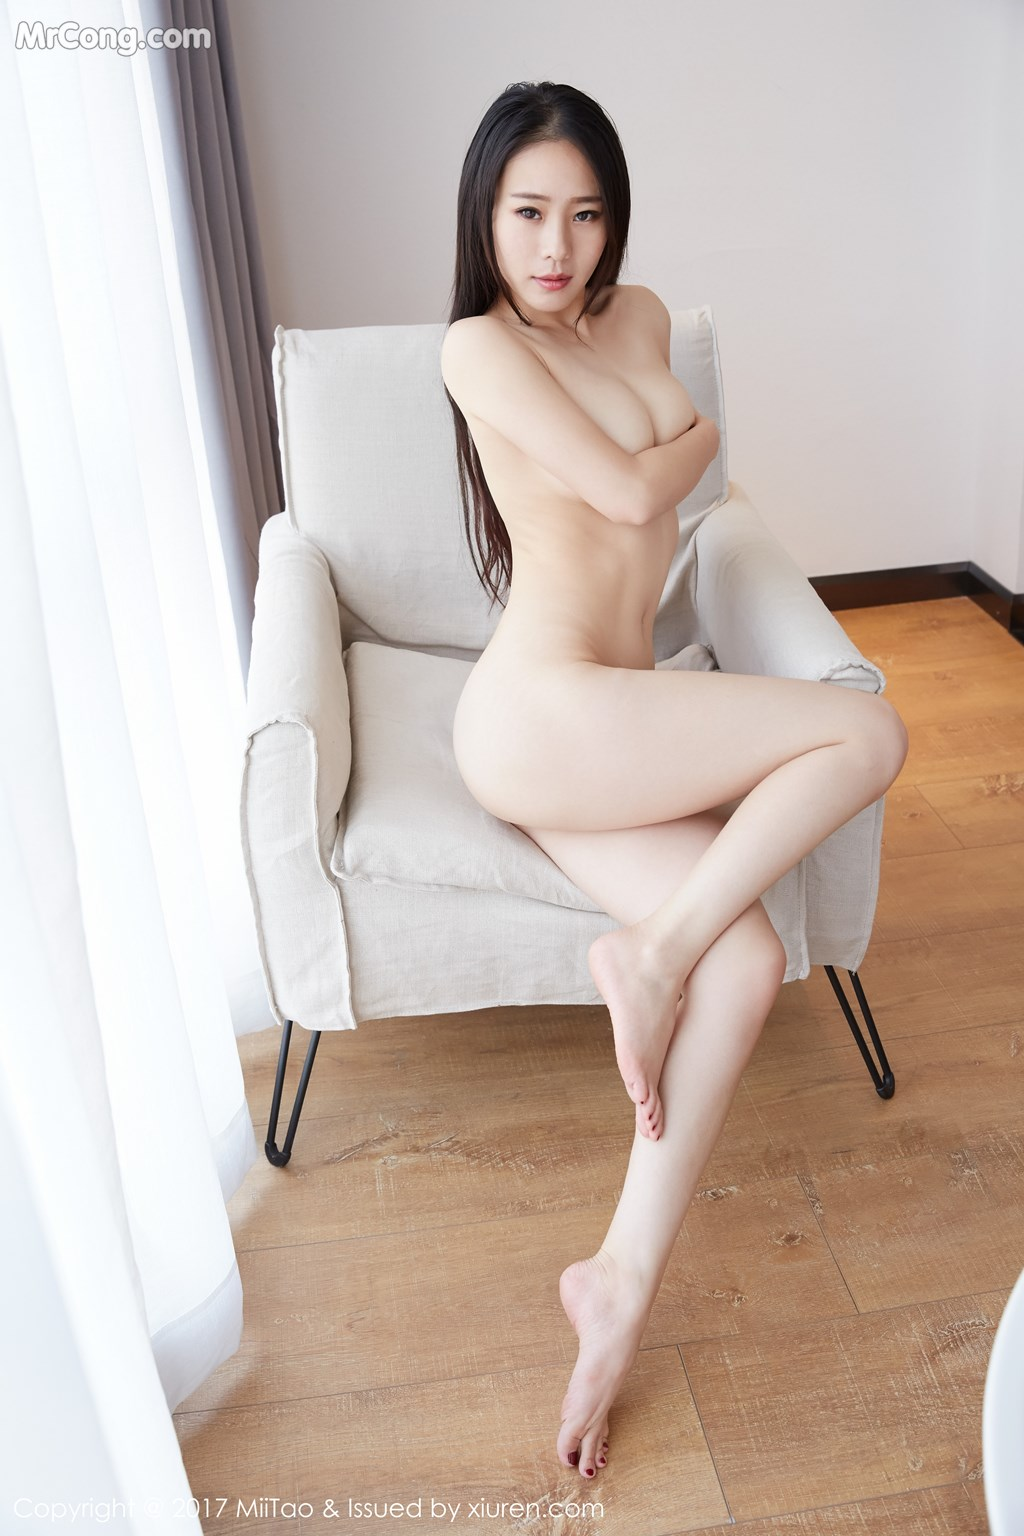 Image MiiTao-Vol.079-Yu-Wei-MrCong.com-047 in post MiiTao Vol.079: Người mẫu Yu Wei (雨薇) (54 ảnh)